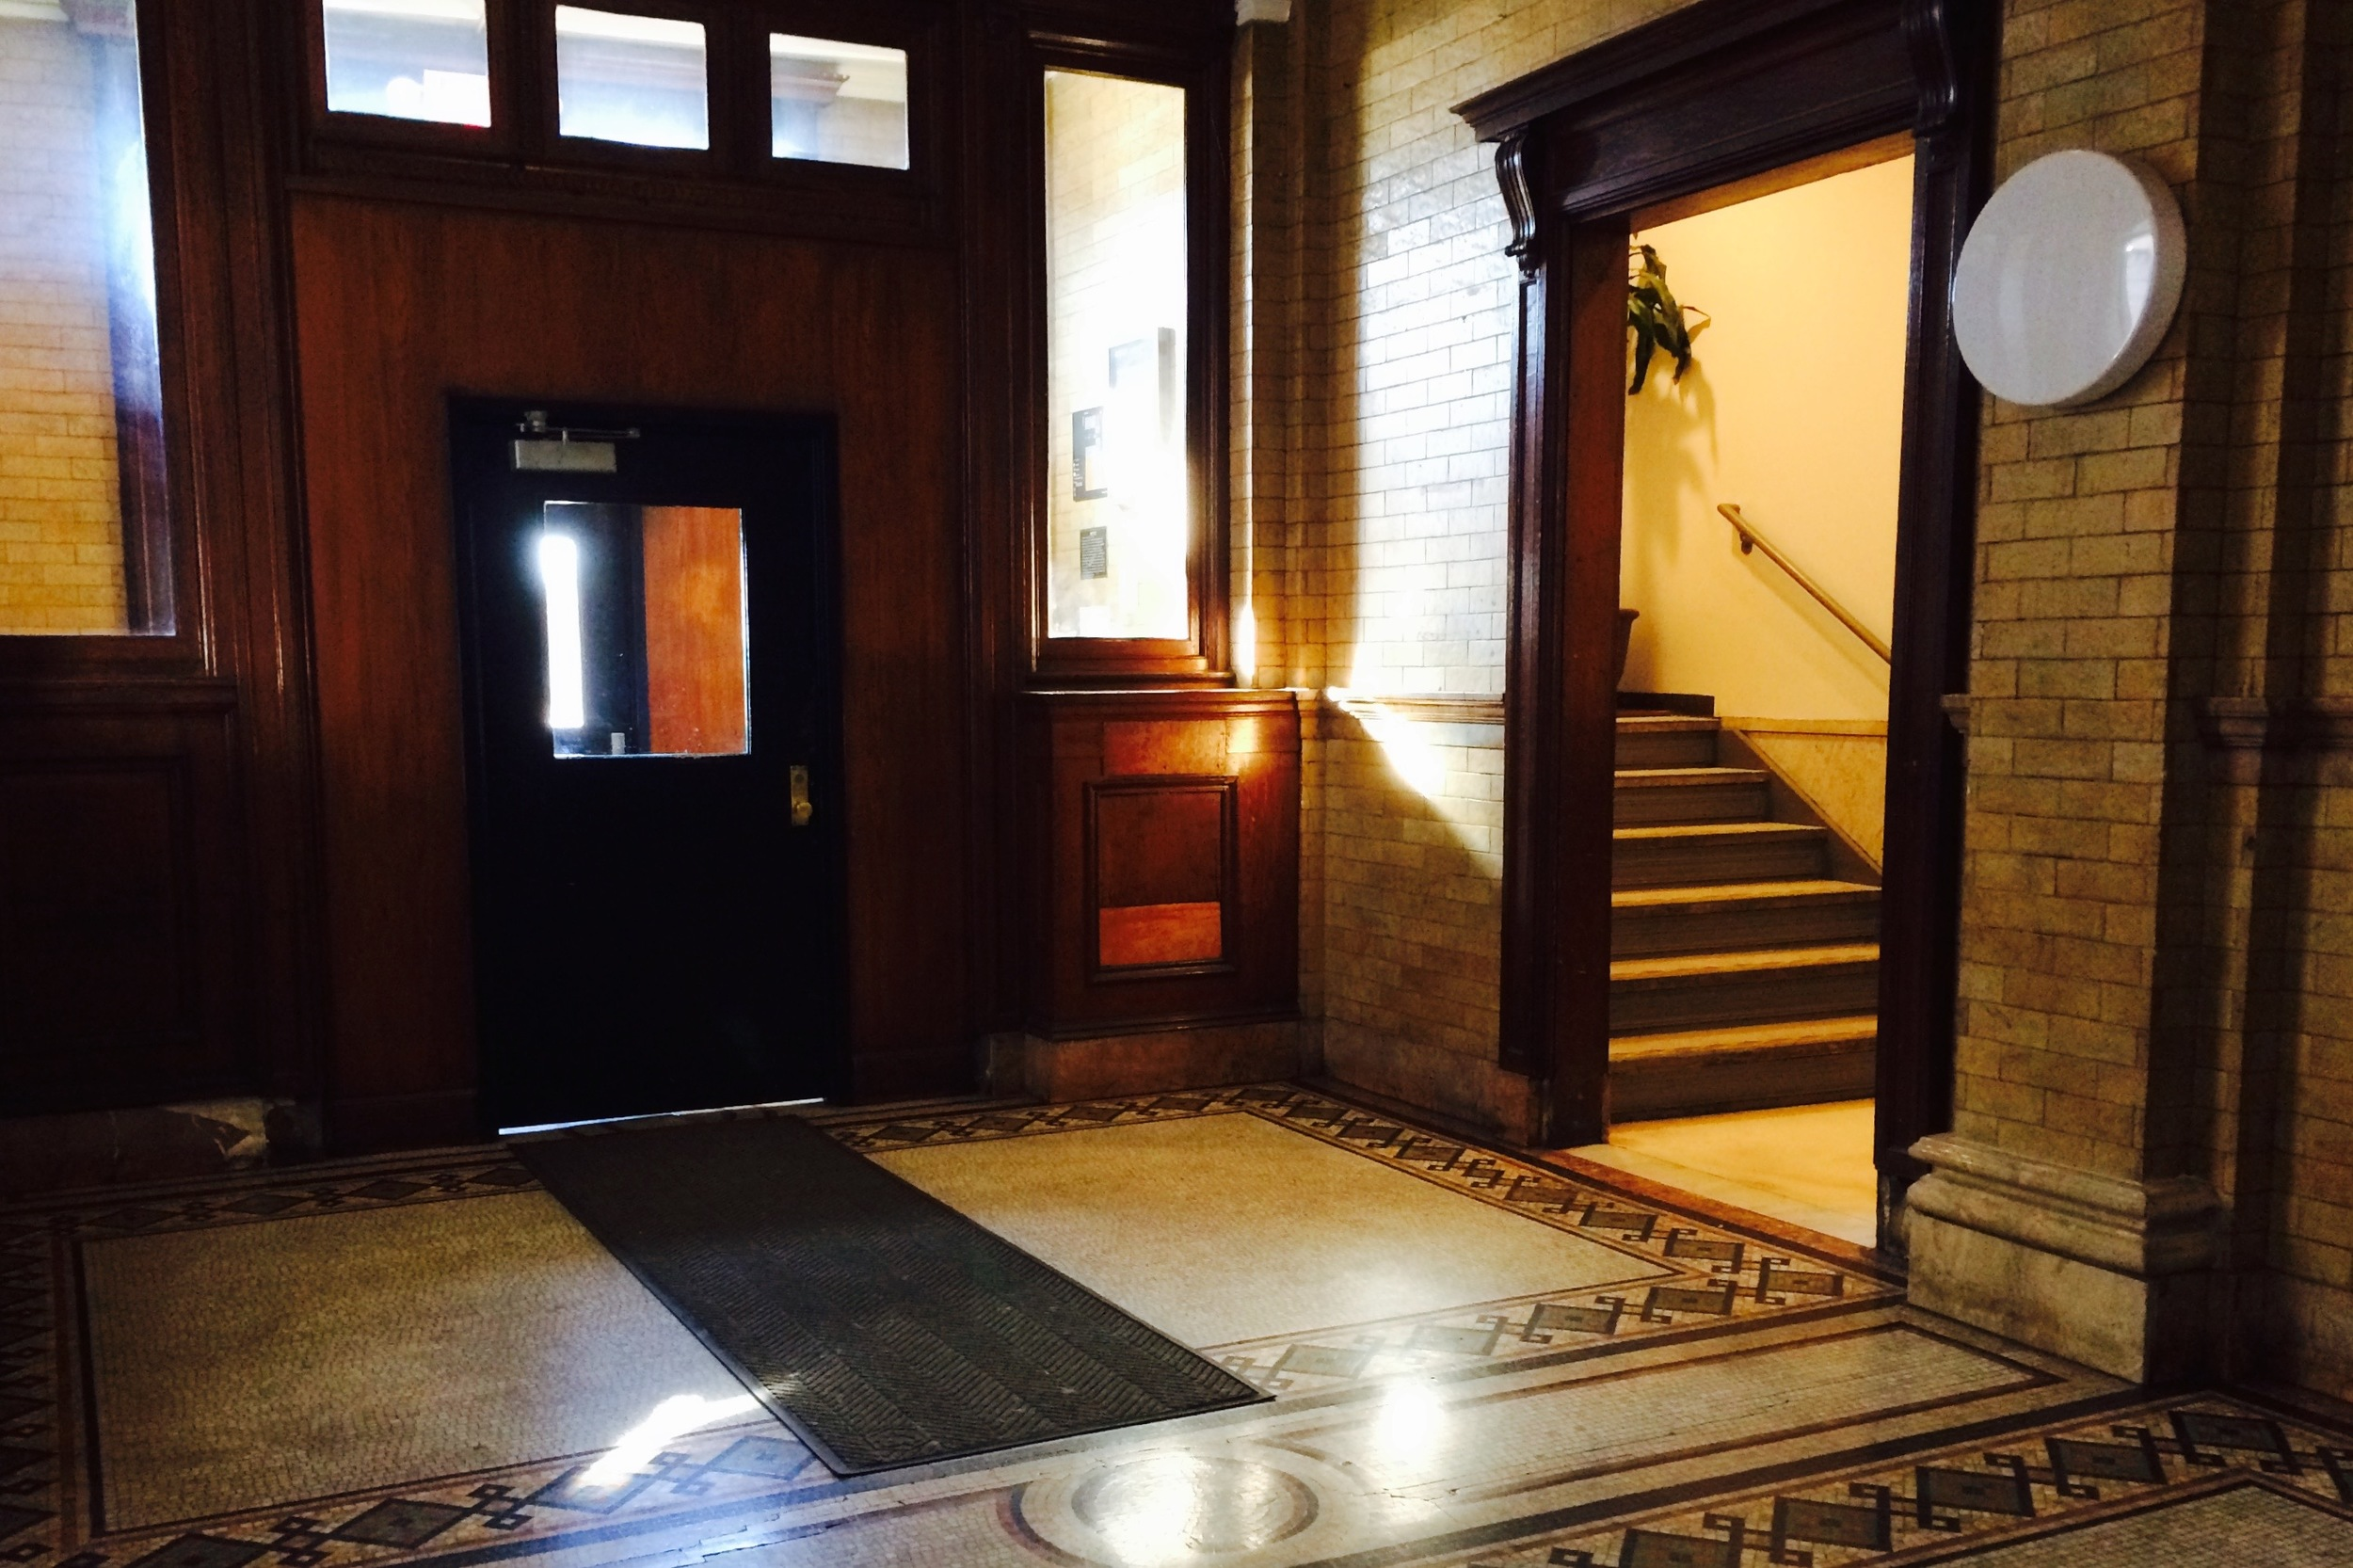 The elevator lobby